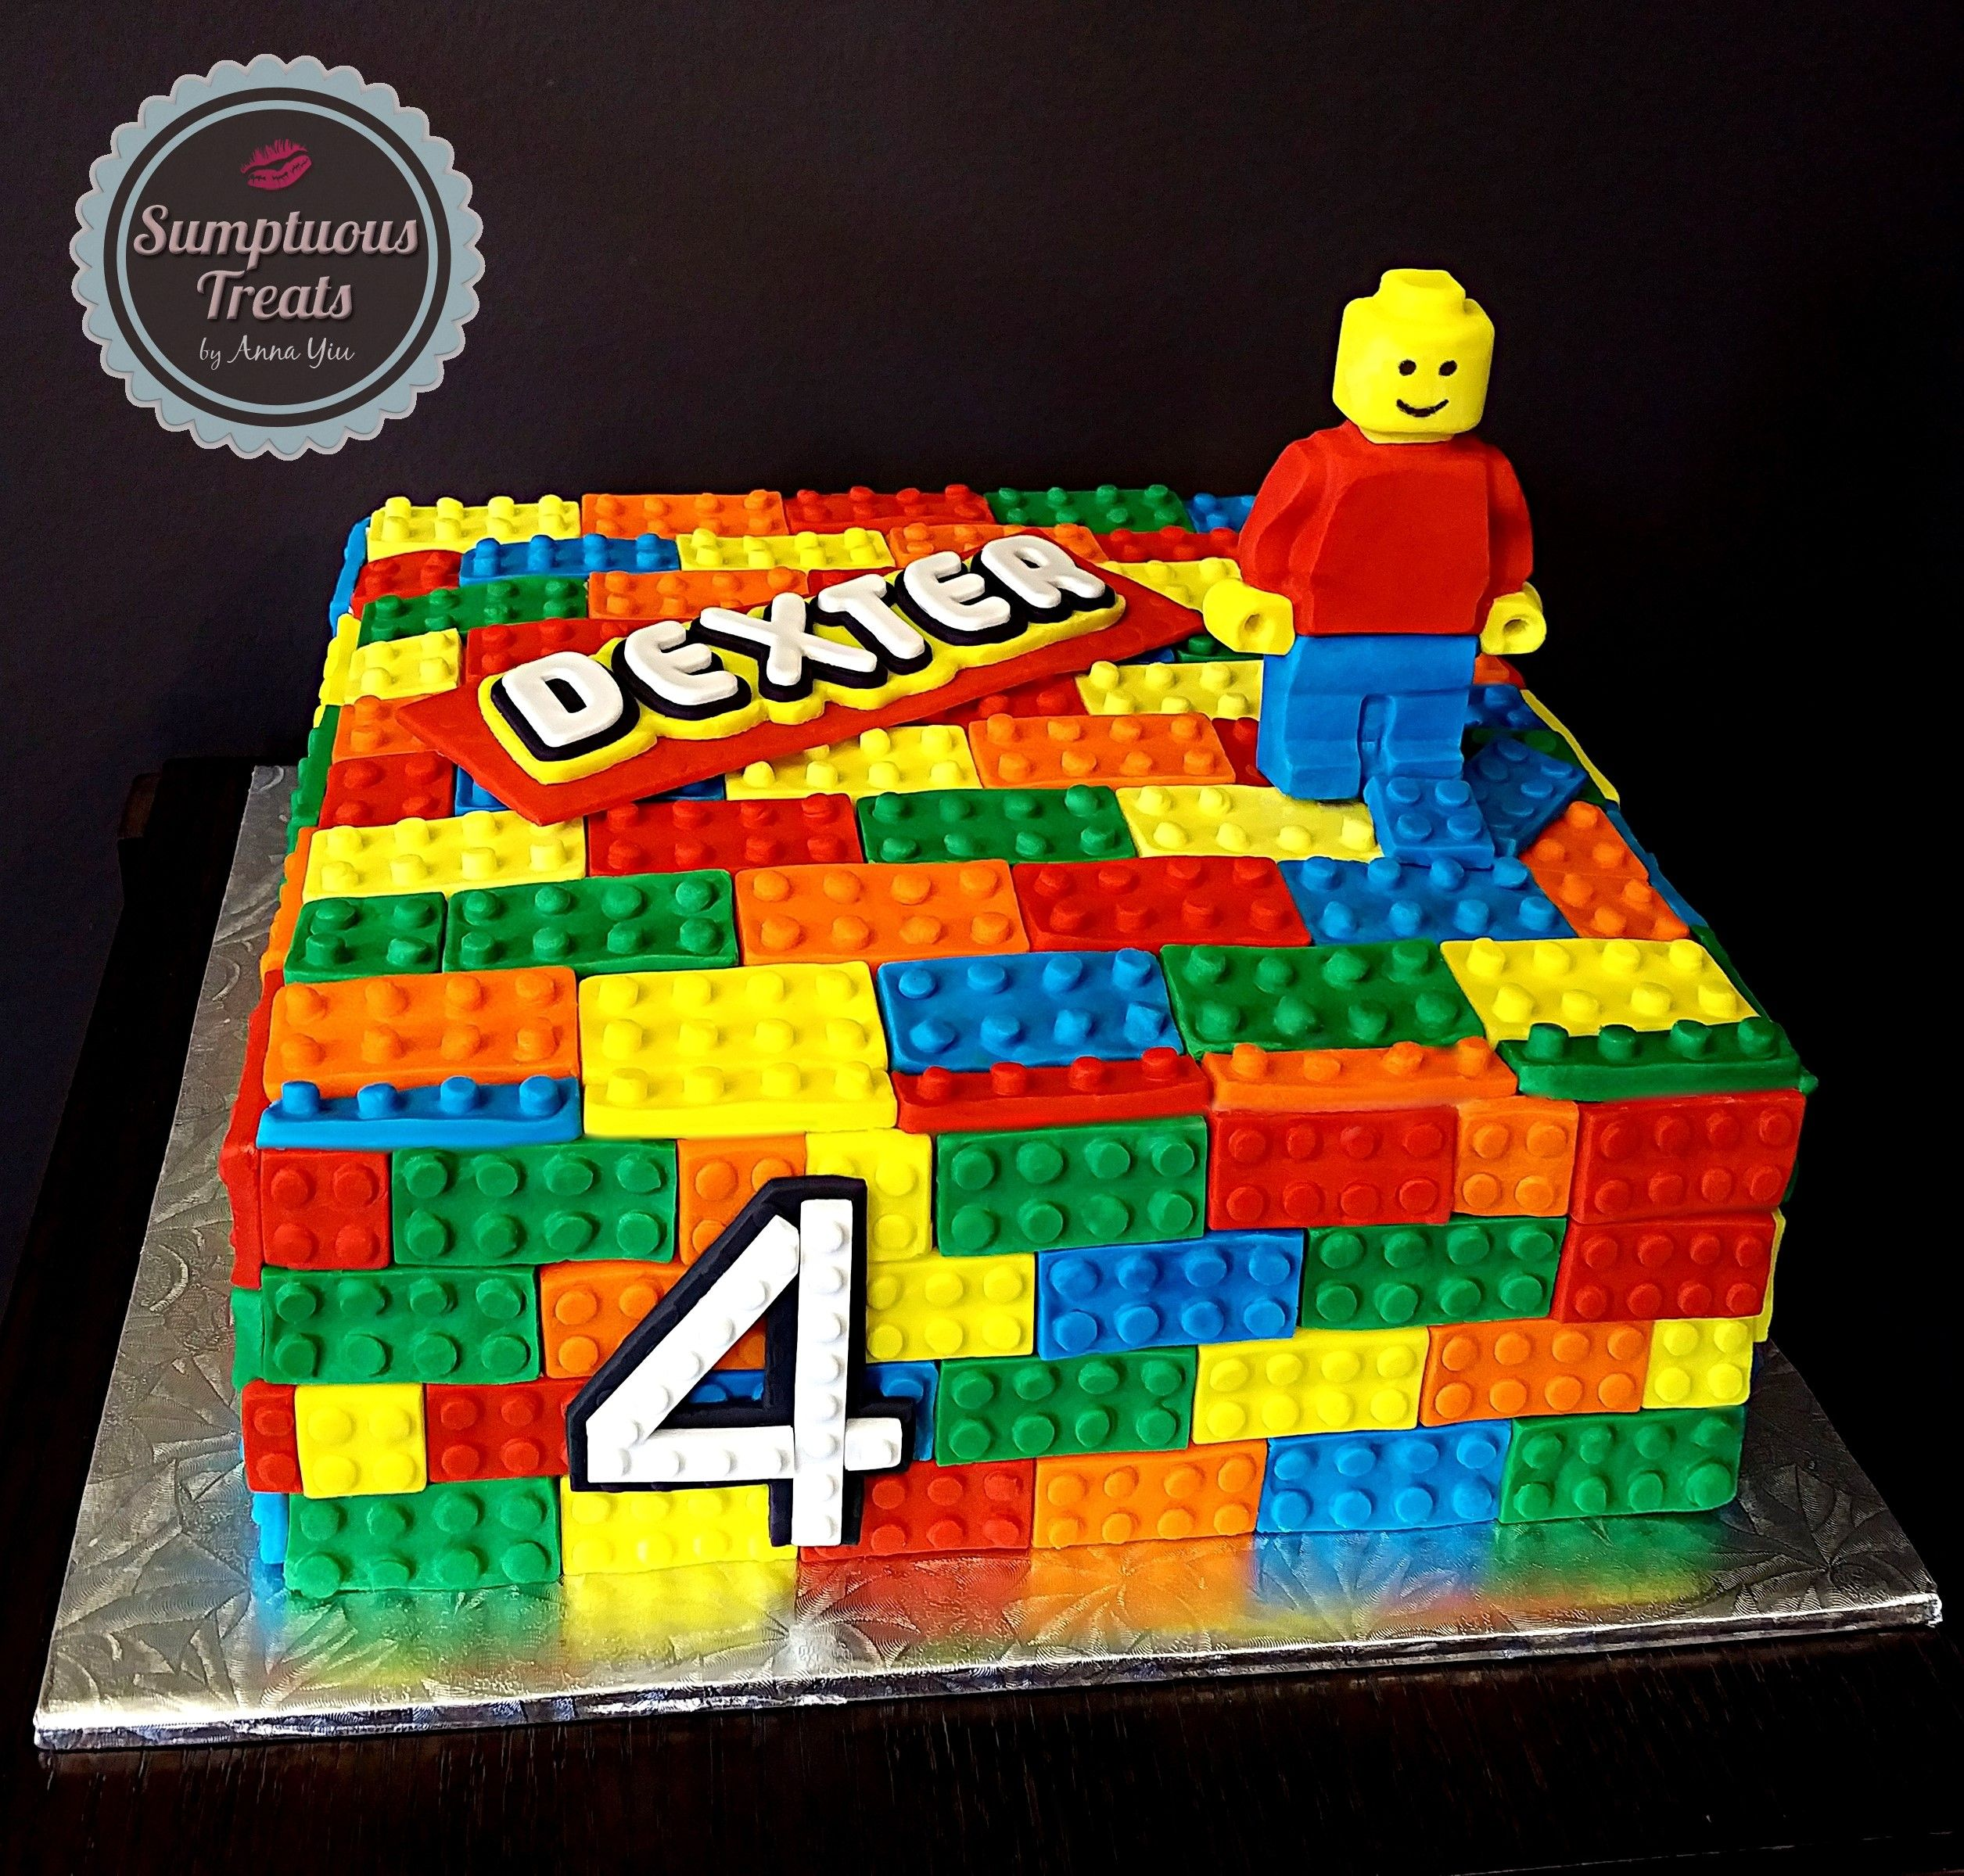 LEGO Cake CustomMadeToOrder Cakes Desserts Edible Art www